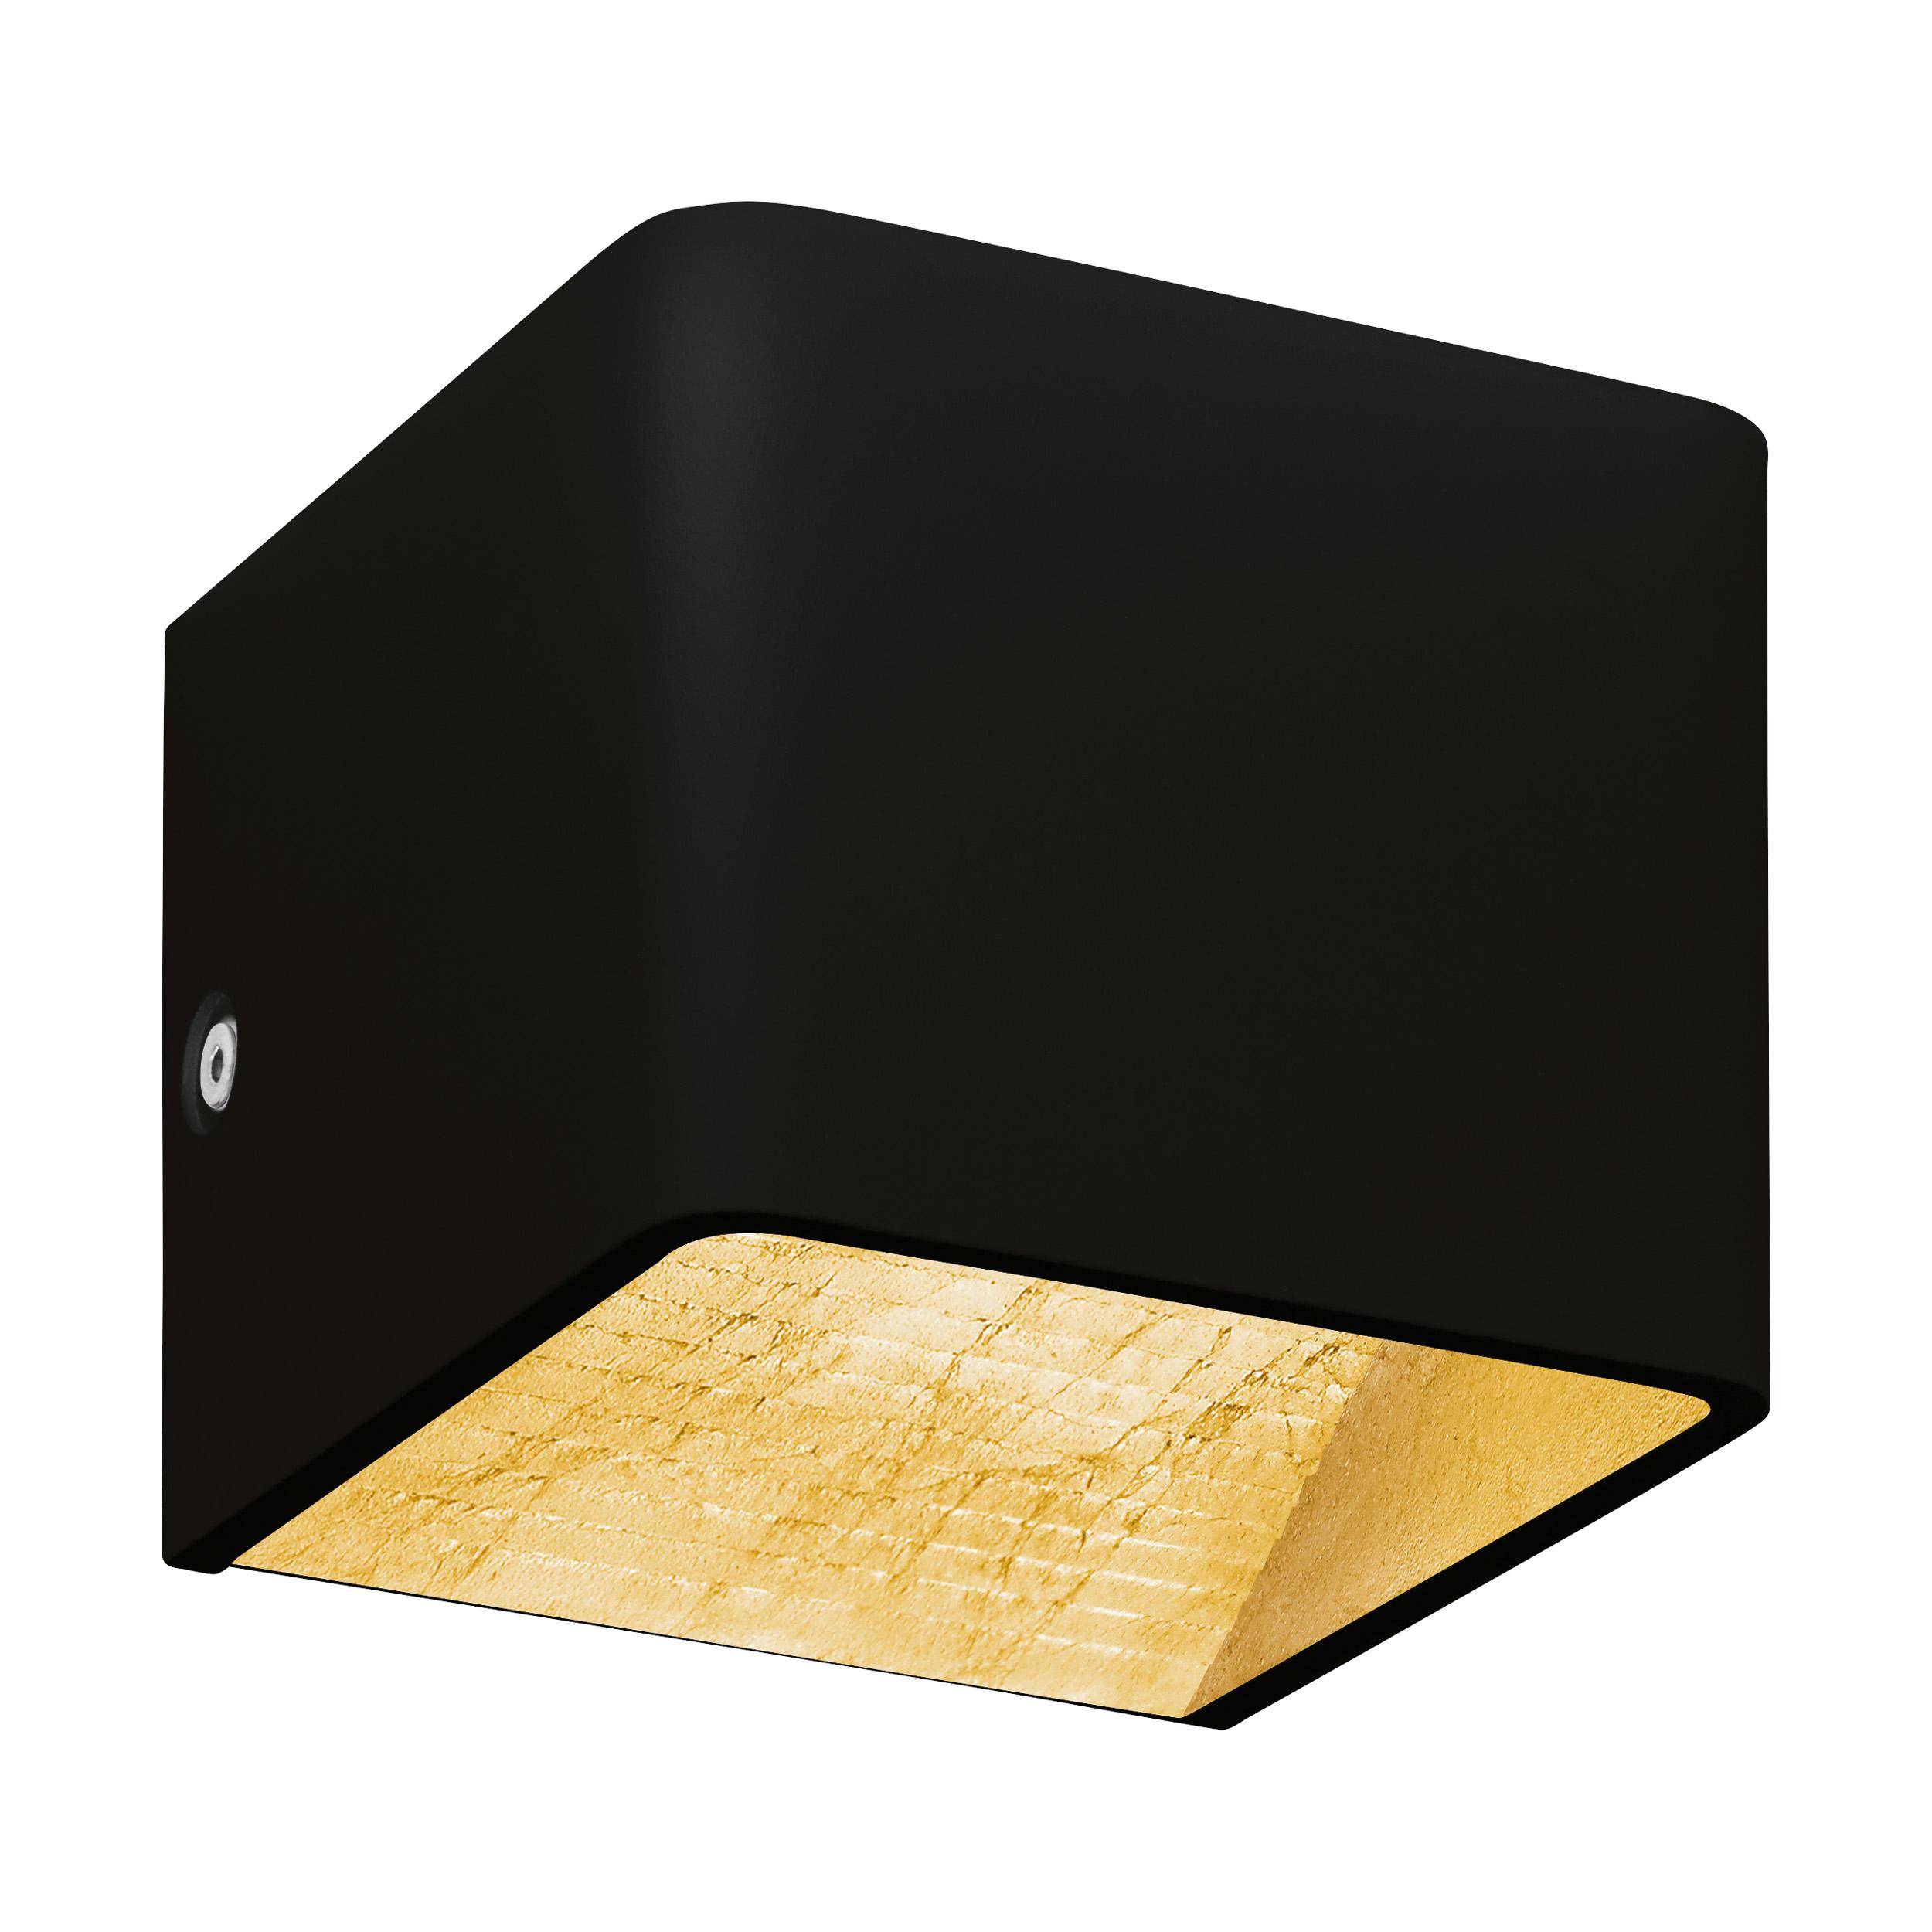 1 Stk Wandleuchte Sania 3 5W 3000K schwarz /blattvergoldet IP20 LI64549---